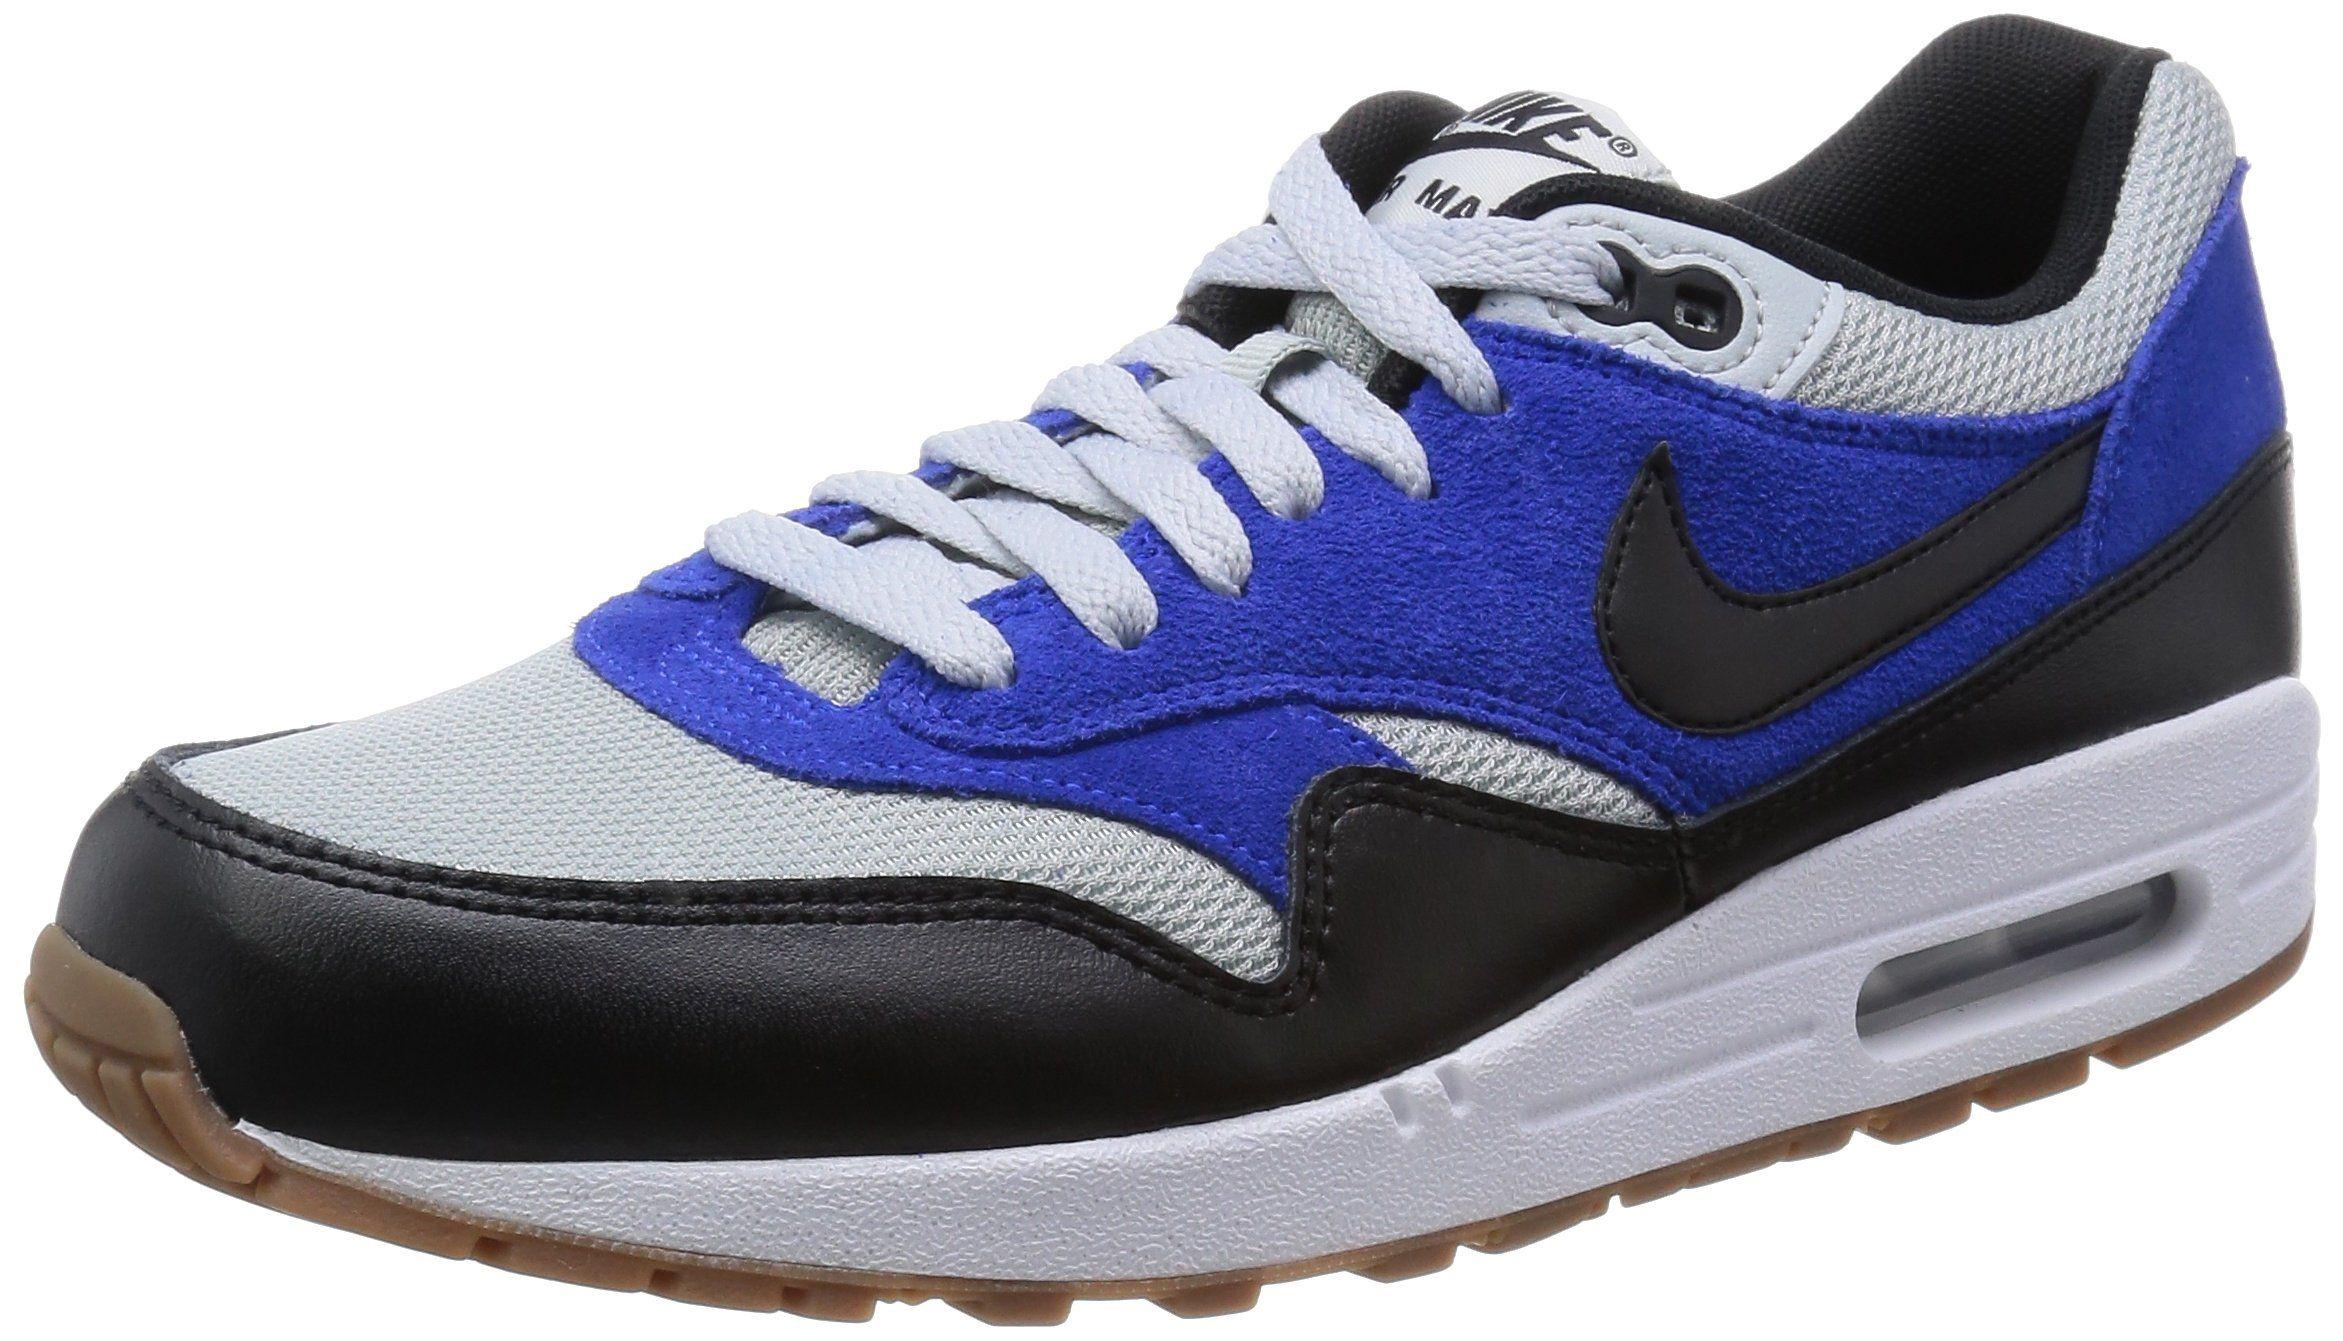 Nike Mens Air Max 1 Essential Shoes Grey Mist/Black/Lyon